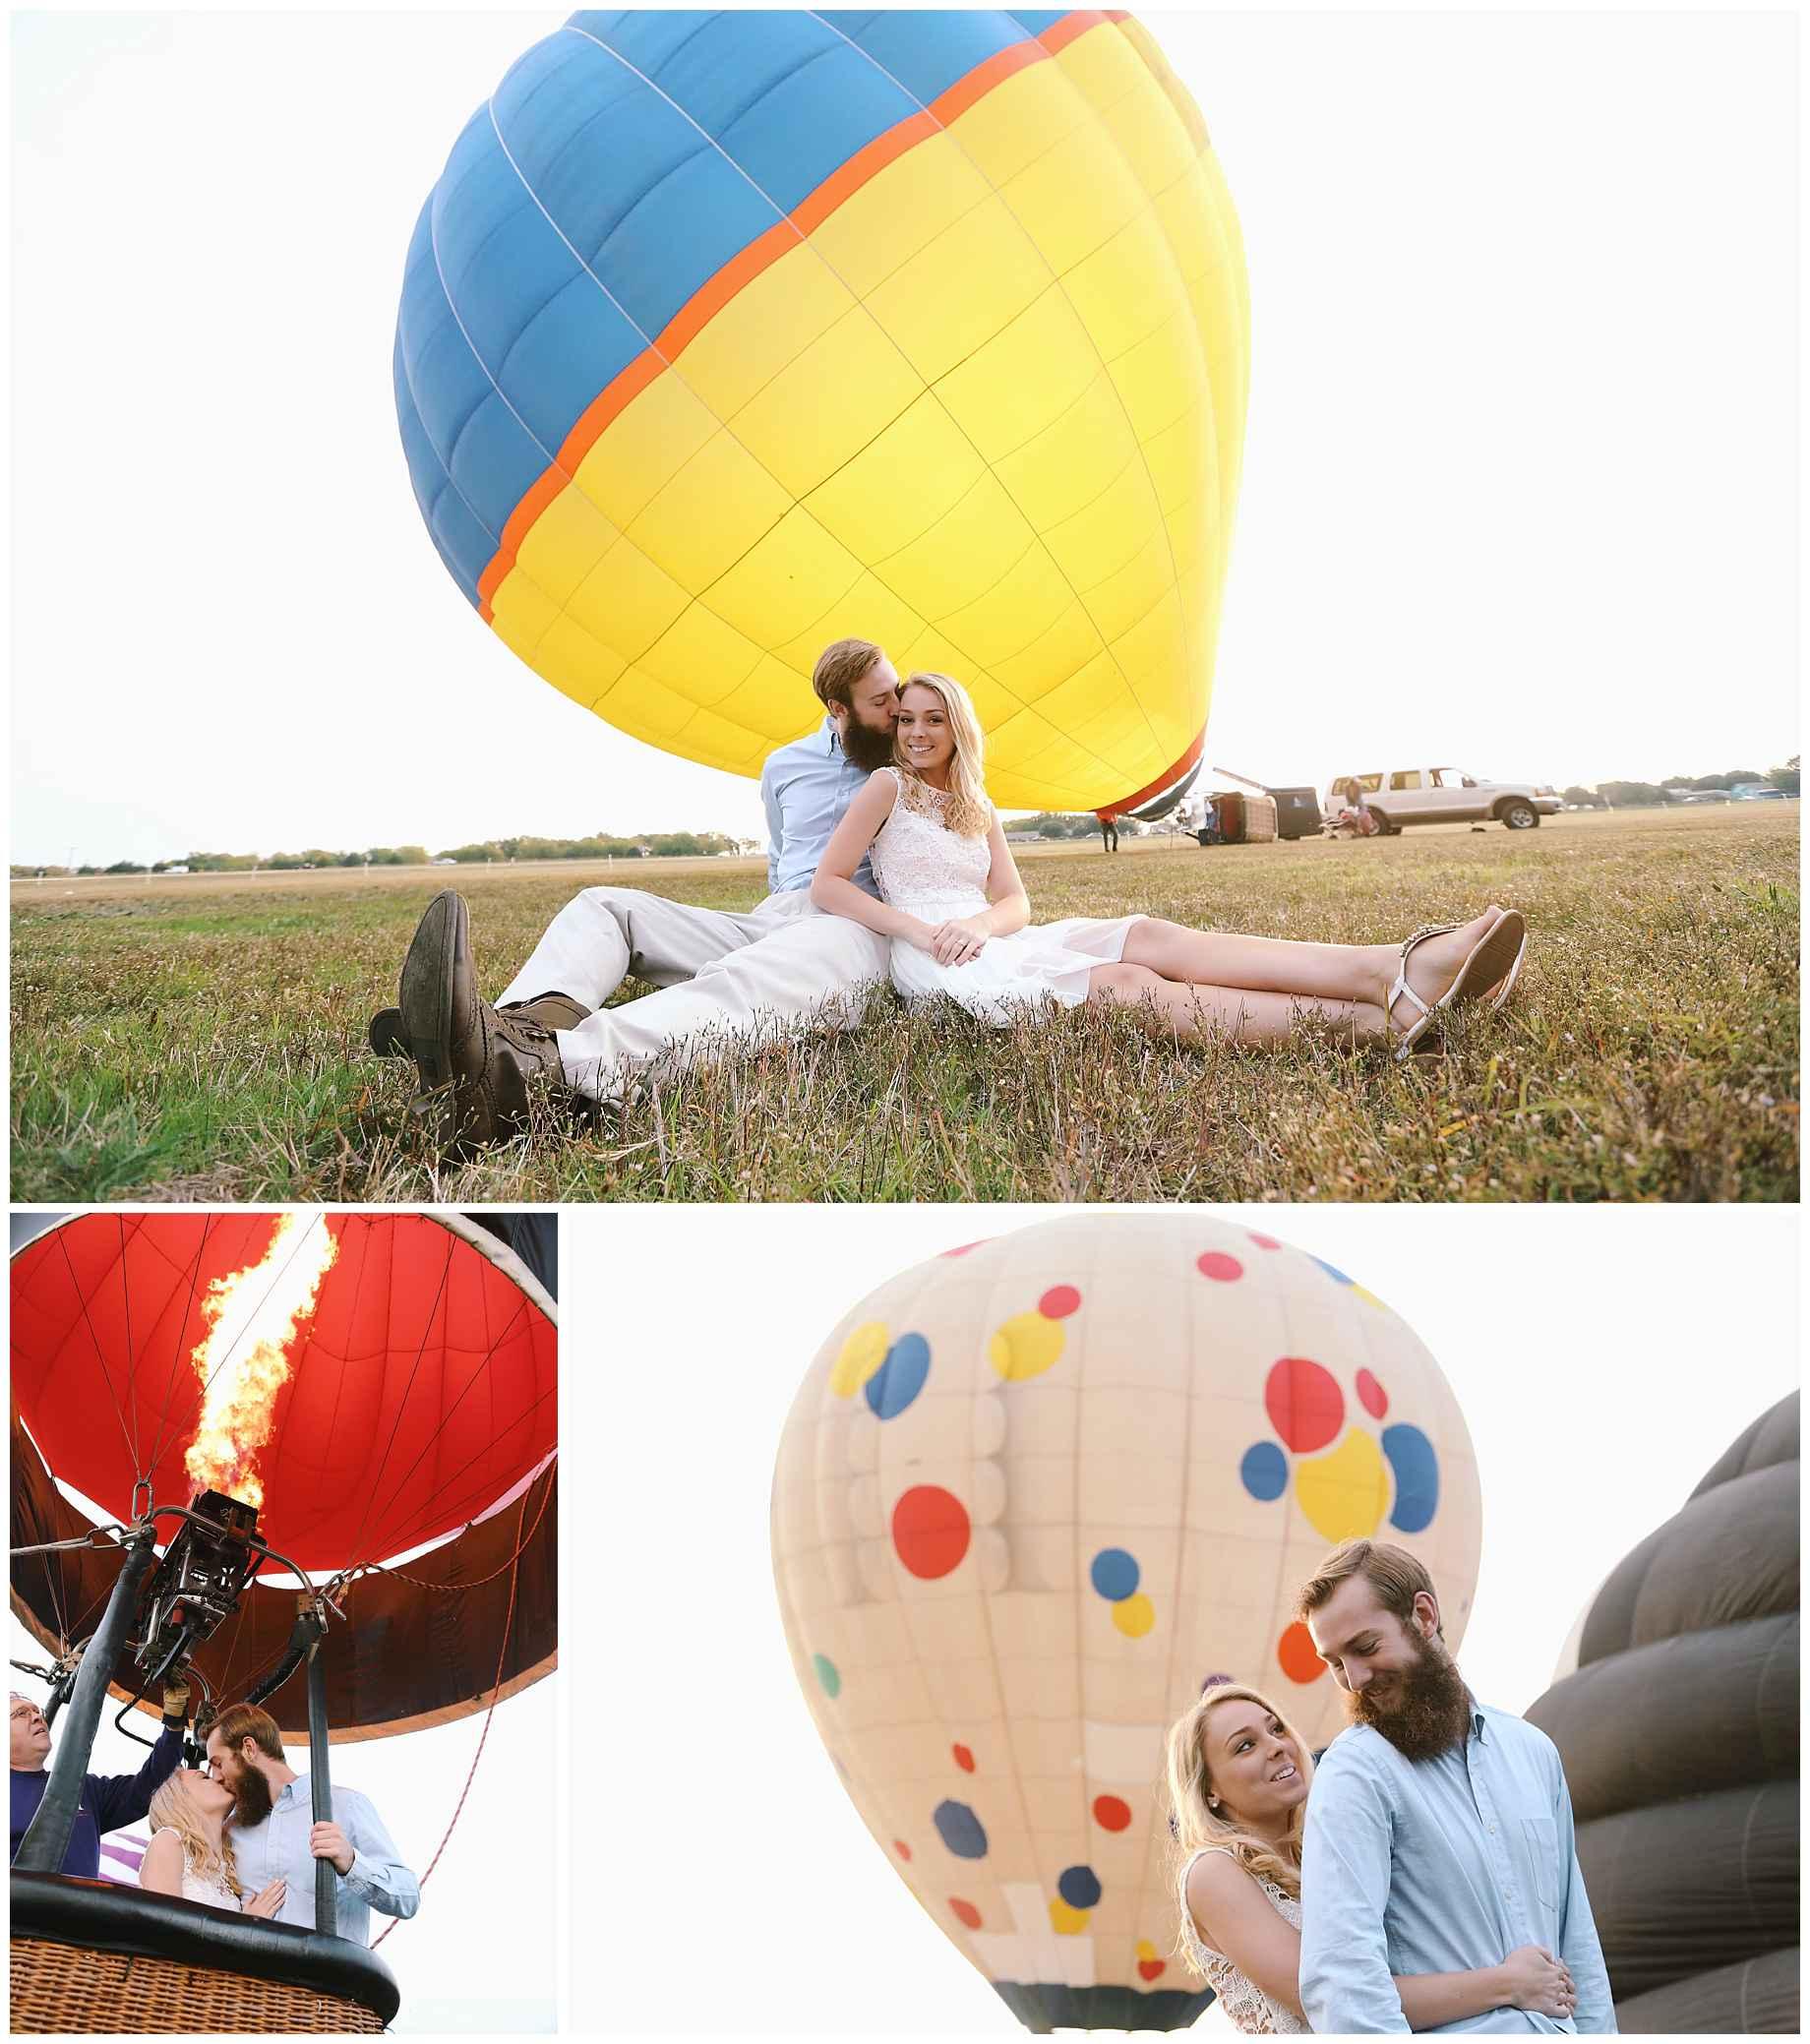 dallas-photographers-ballons-02